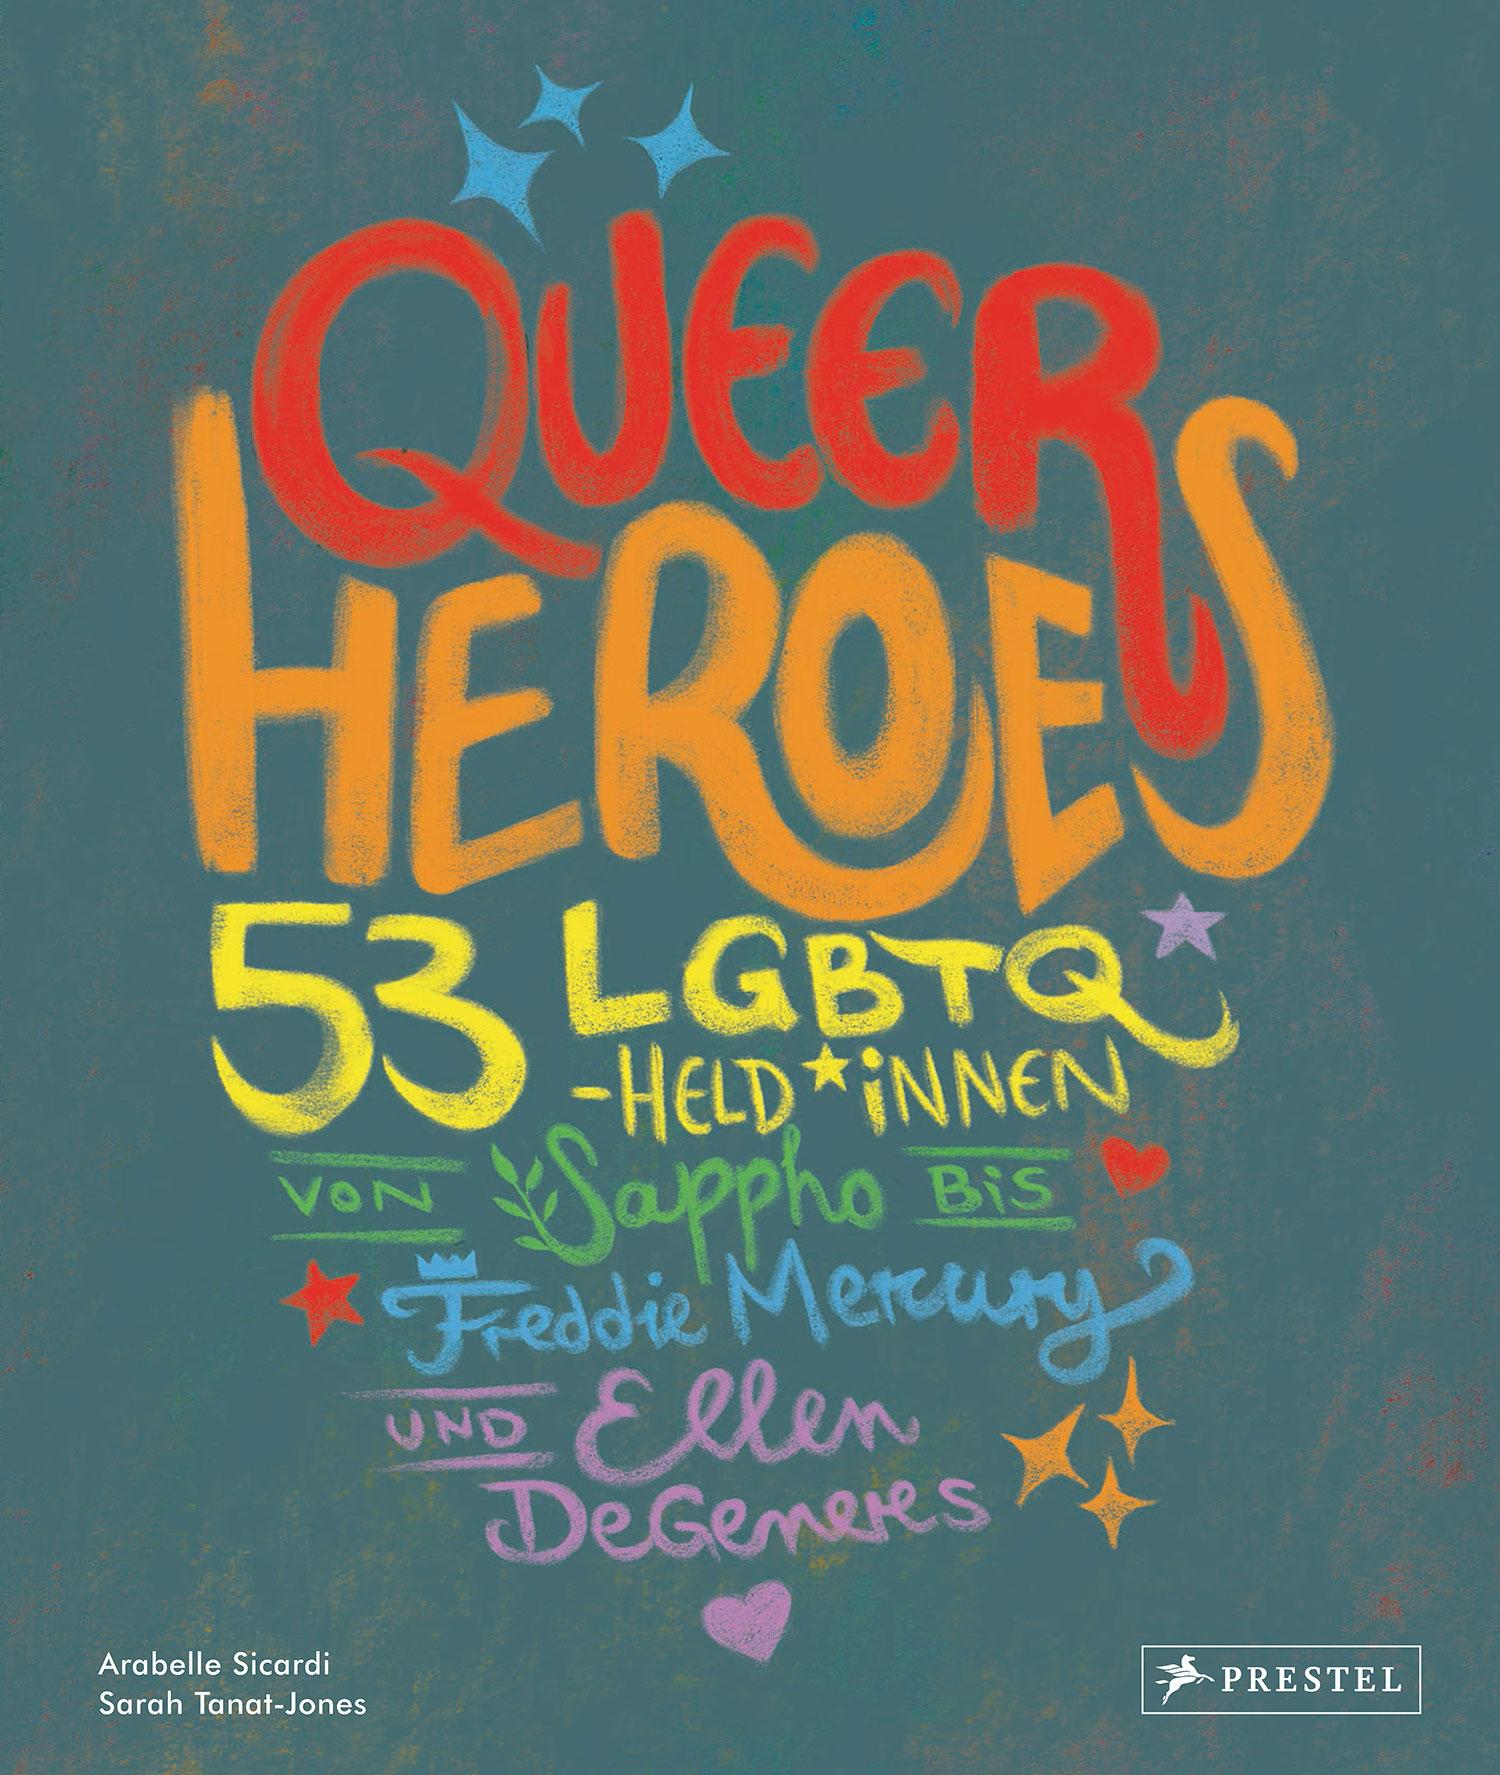 »QUEER HEROES. 53 LGBTQ-HELD*INNEN« — PRESTEL